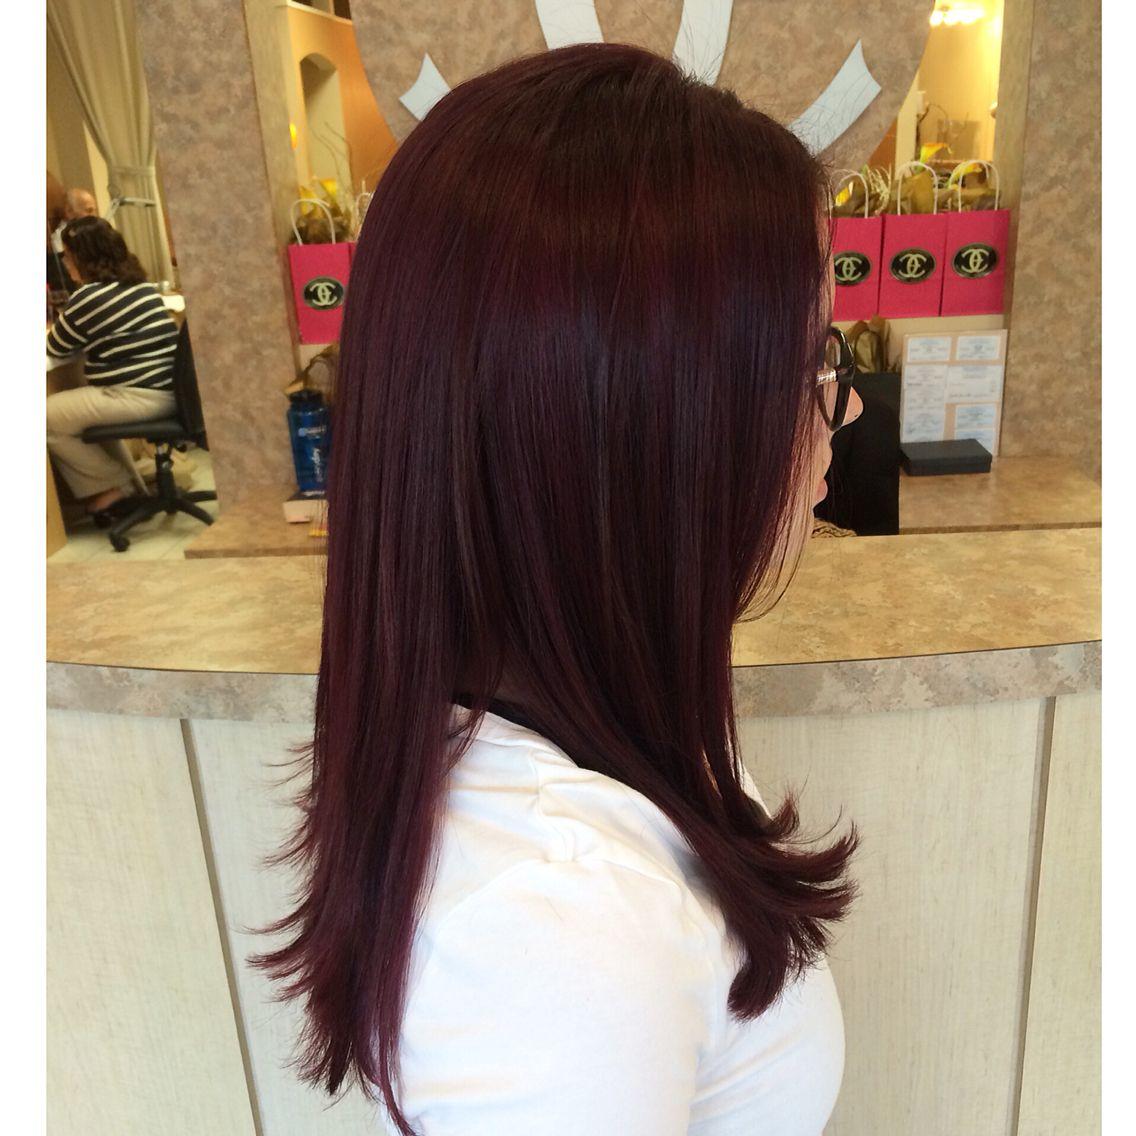 Merlot hair color - Violet Red Hair Color Auburn Merlot Hair